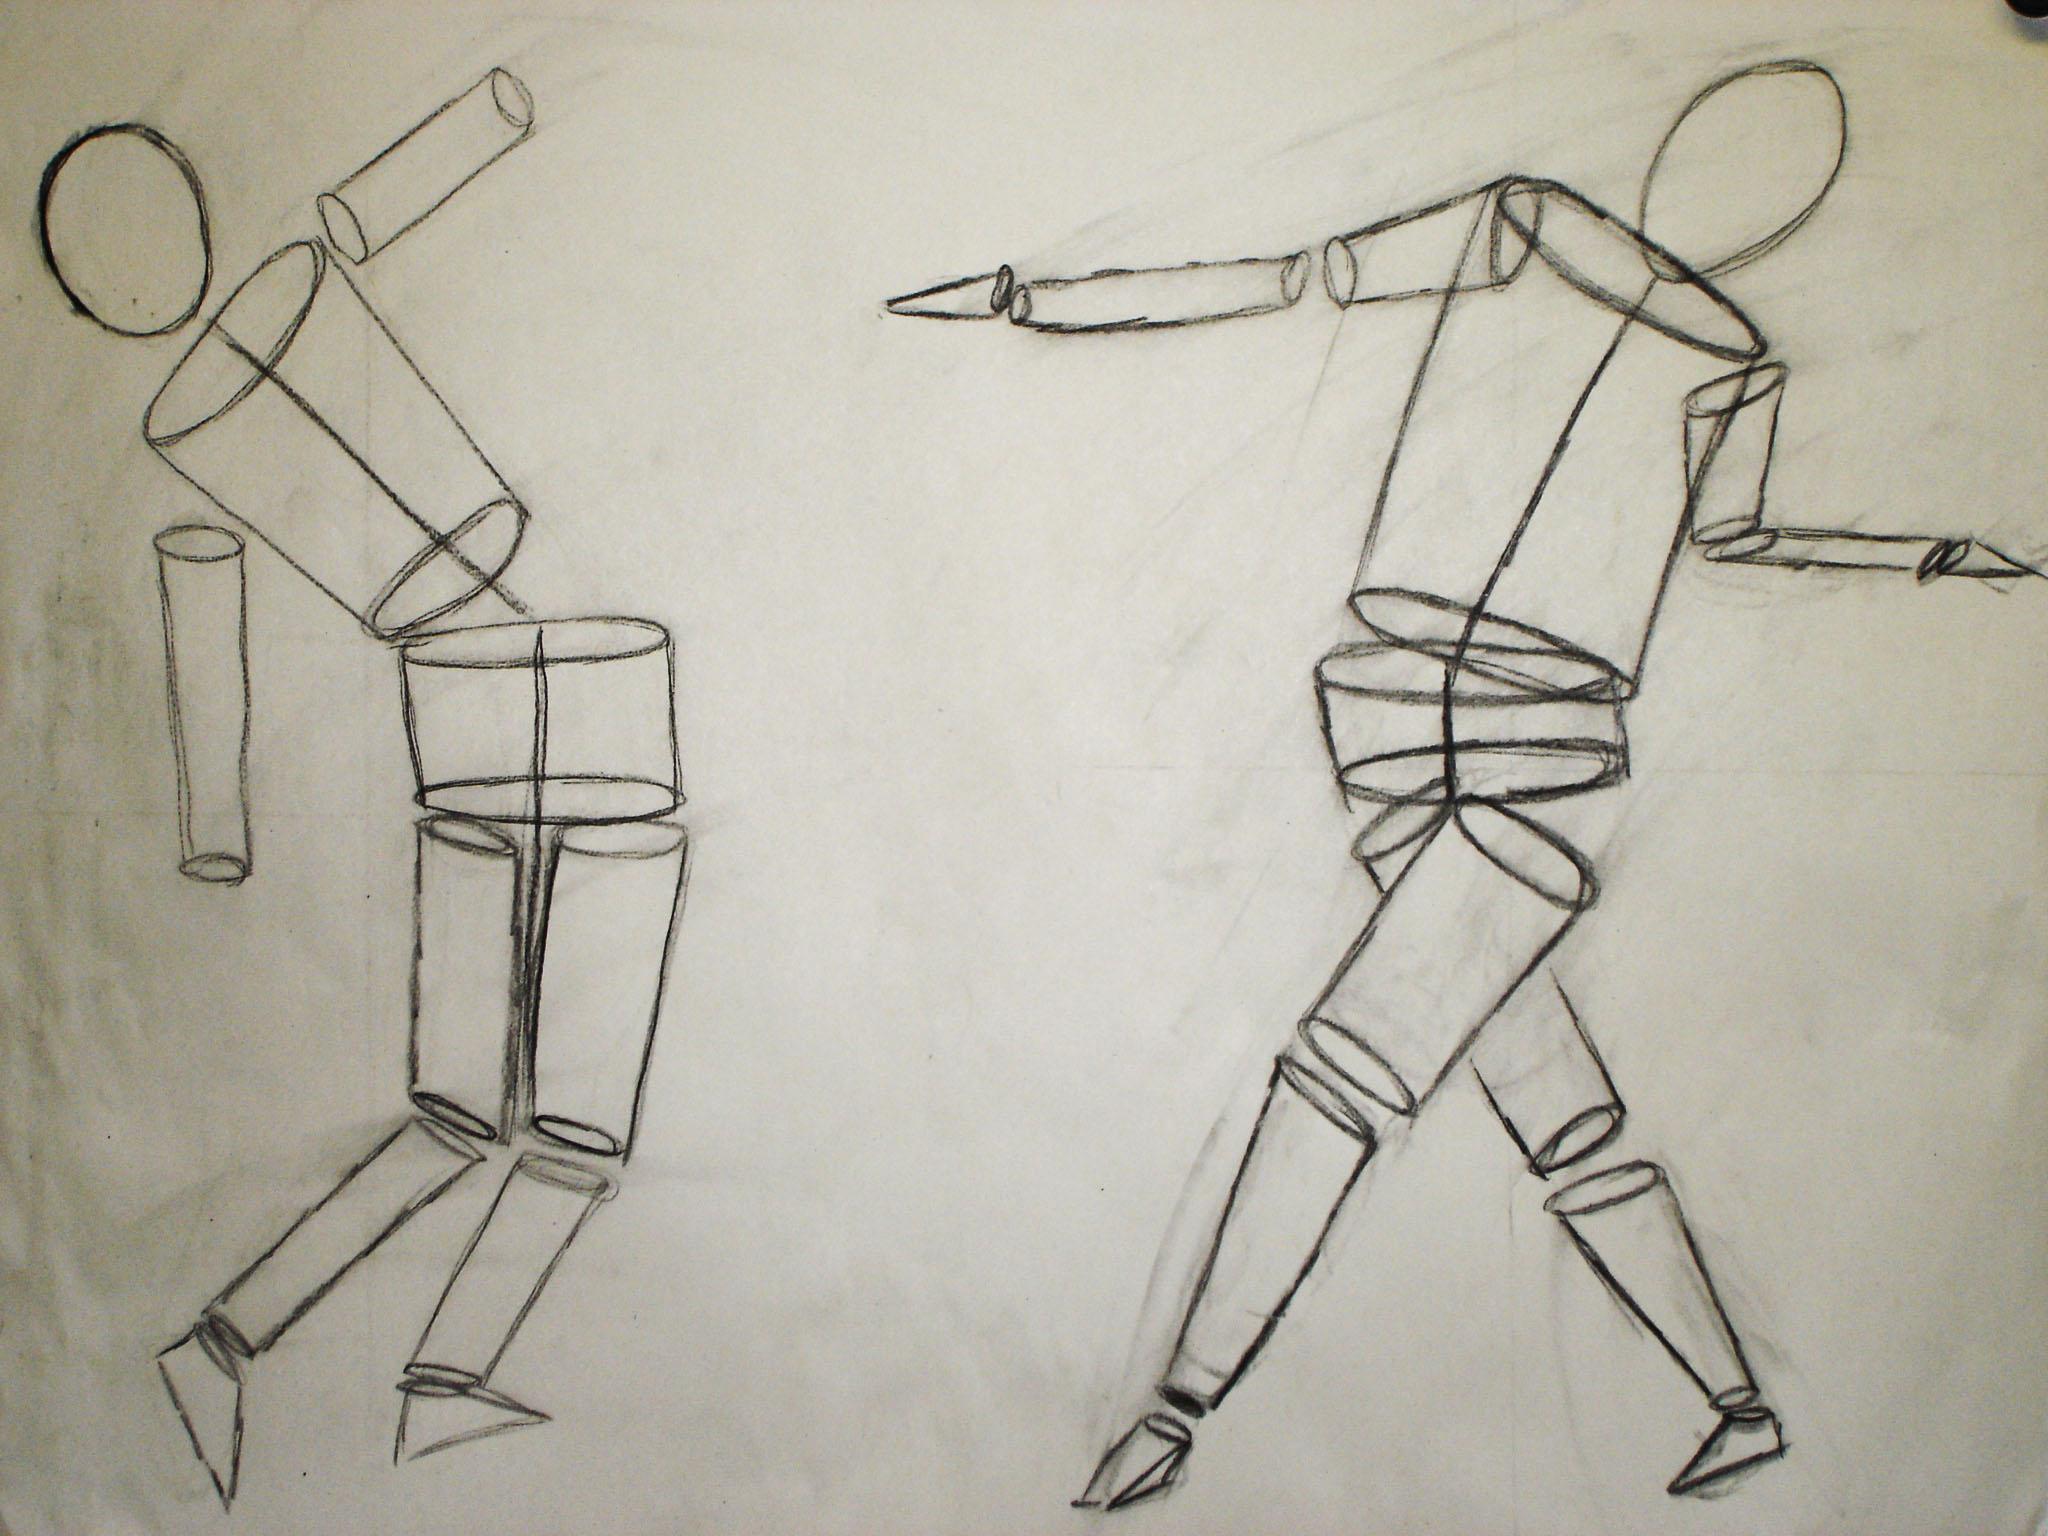 2048x1536 Figure Drawing, Human Form In Basic Shapes Drawingillustrations